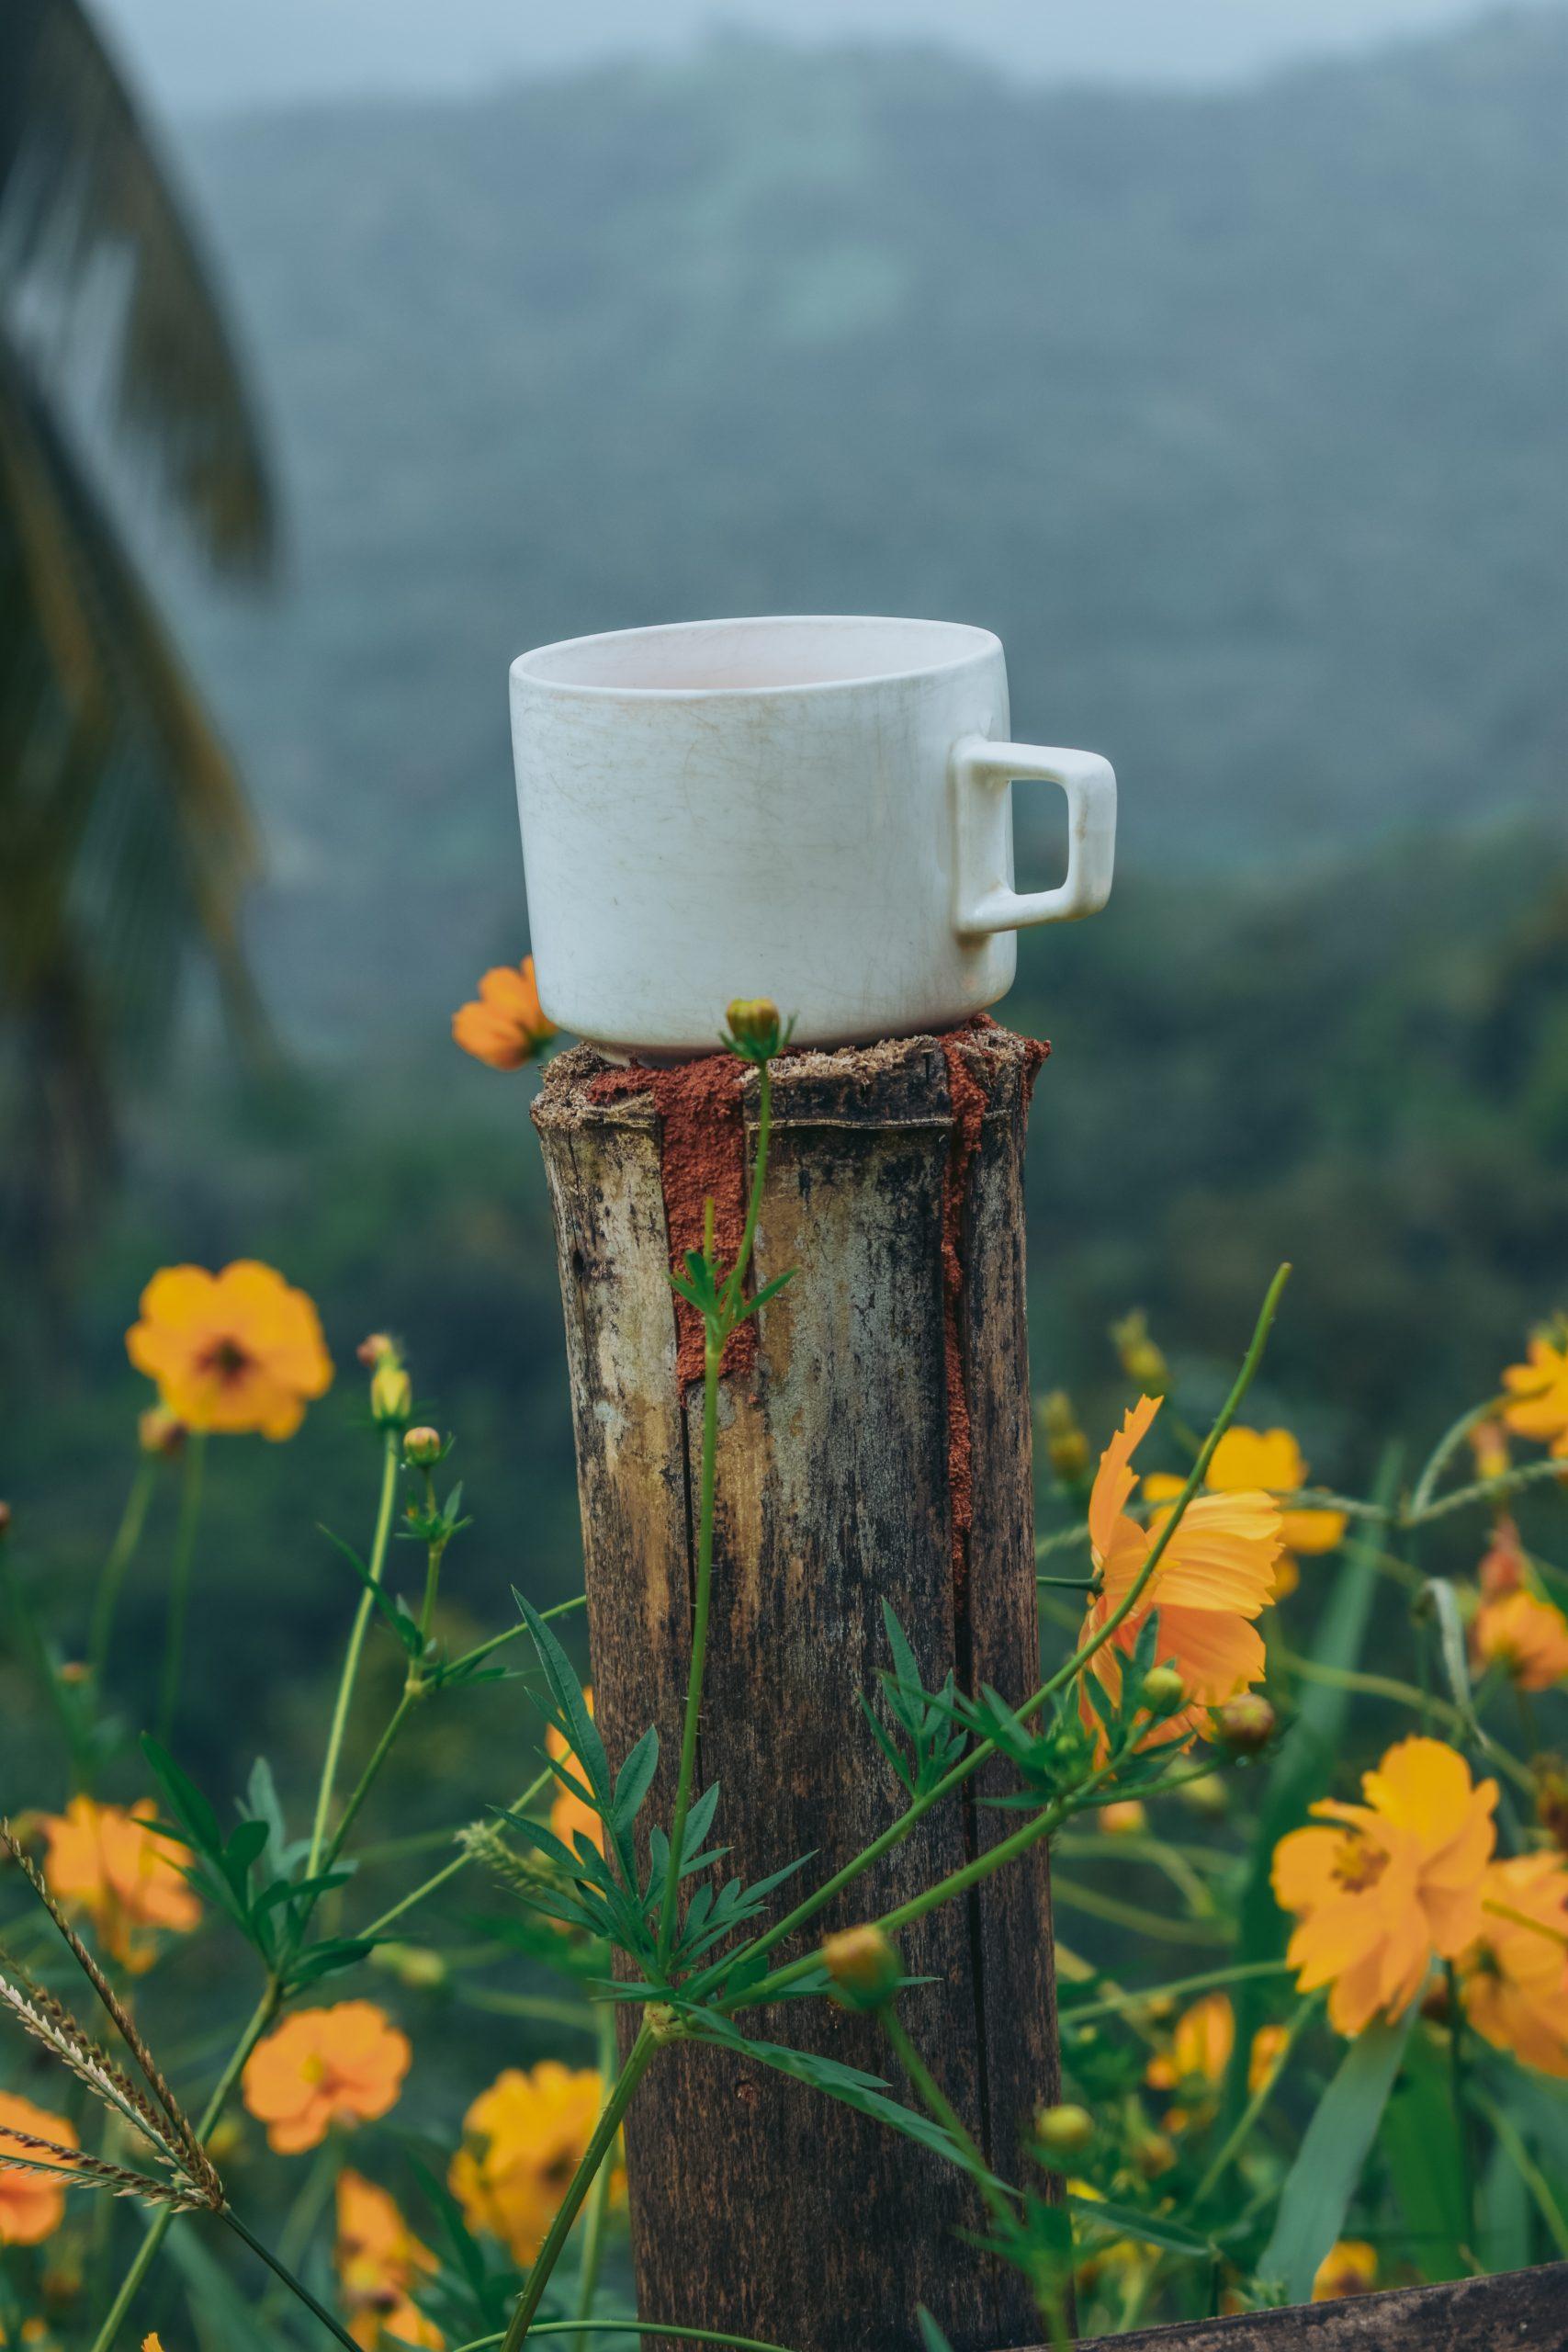 white ceramic mug on brown wooden post